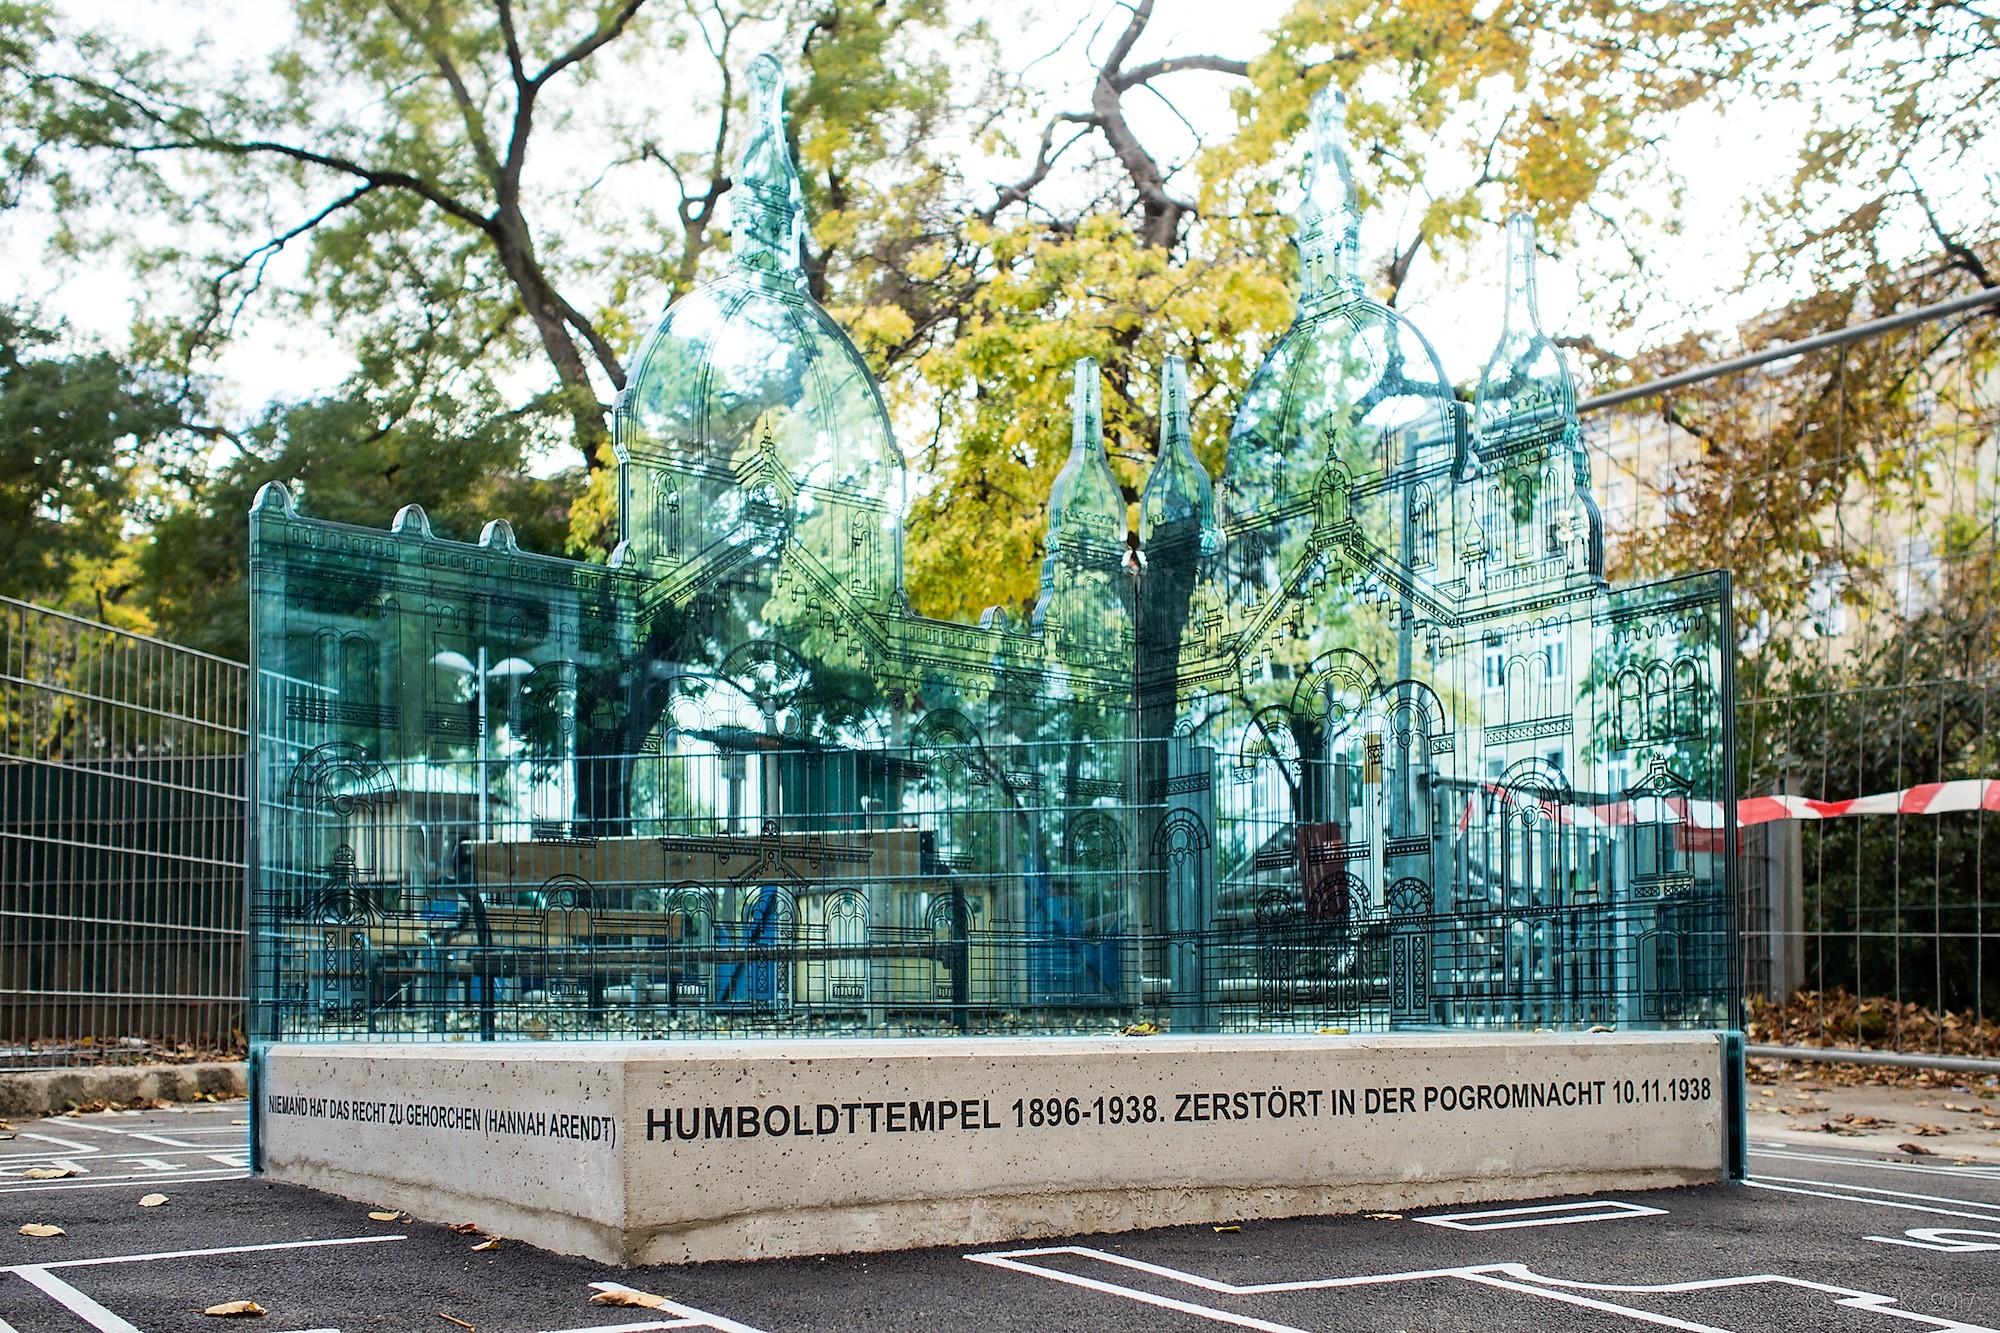 Humboldttempel-Denkmal